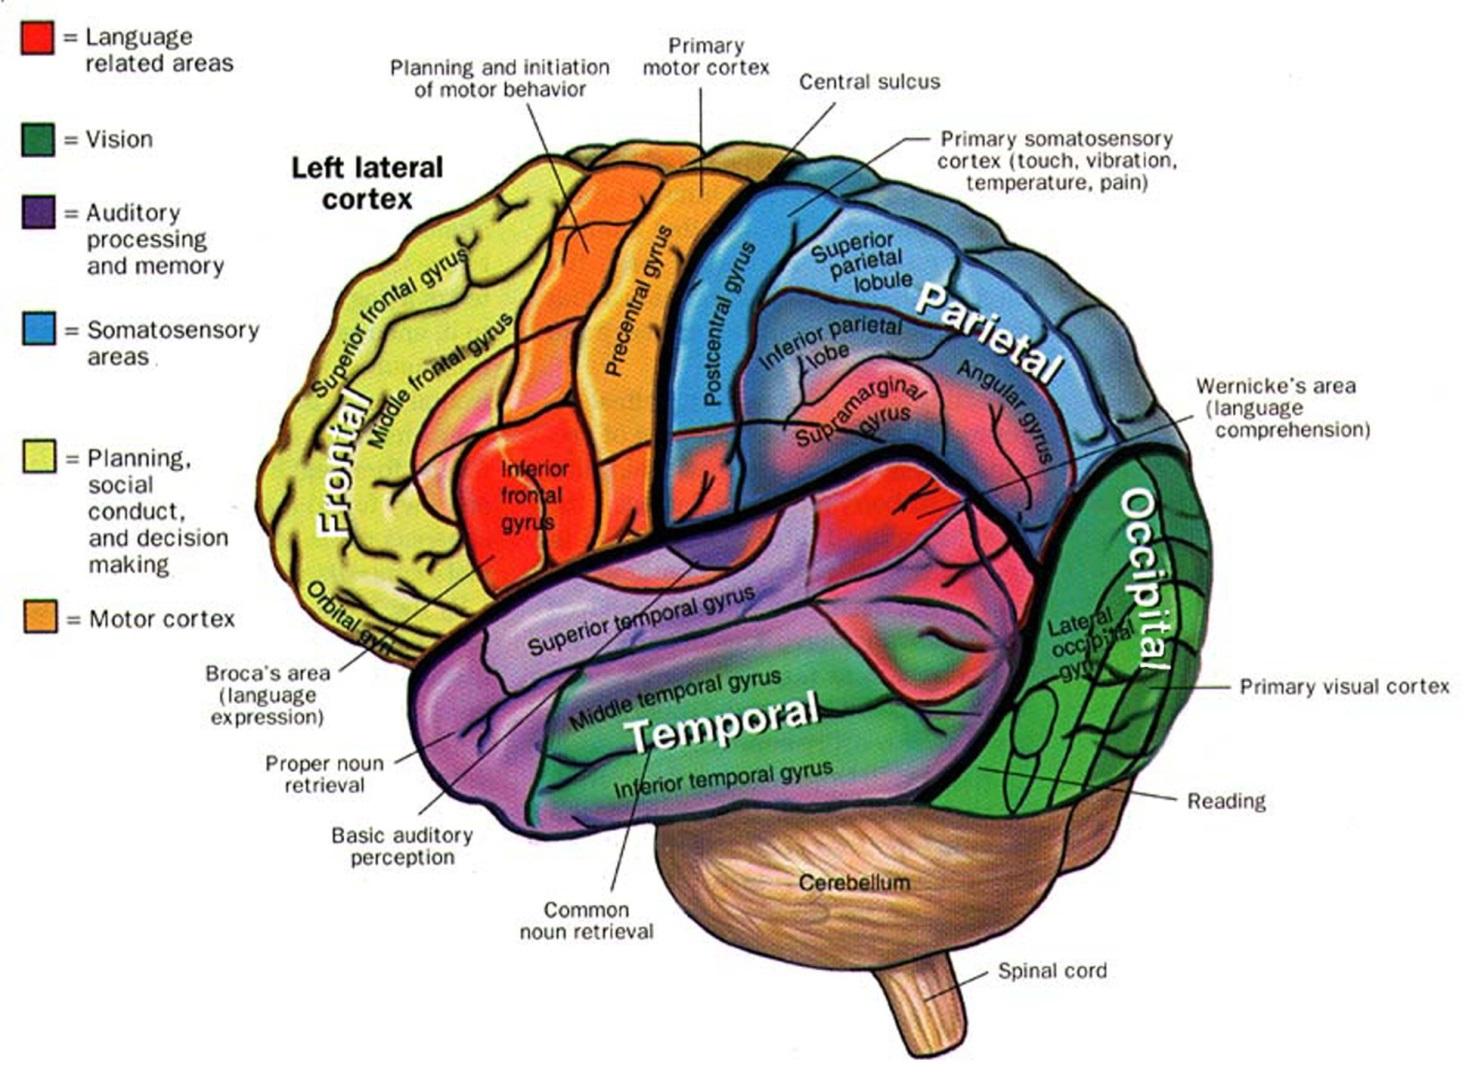 Imagequiz Brain Anatomy For Cmu 85 429 Pt 3